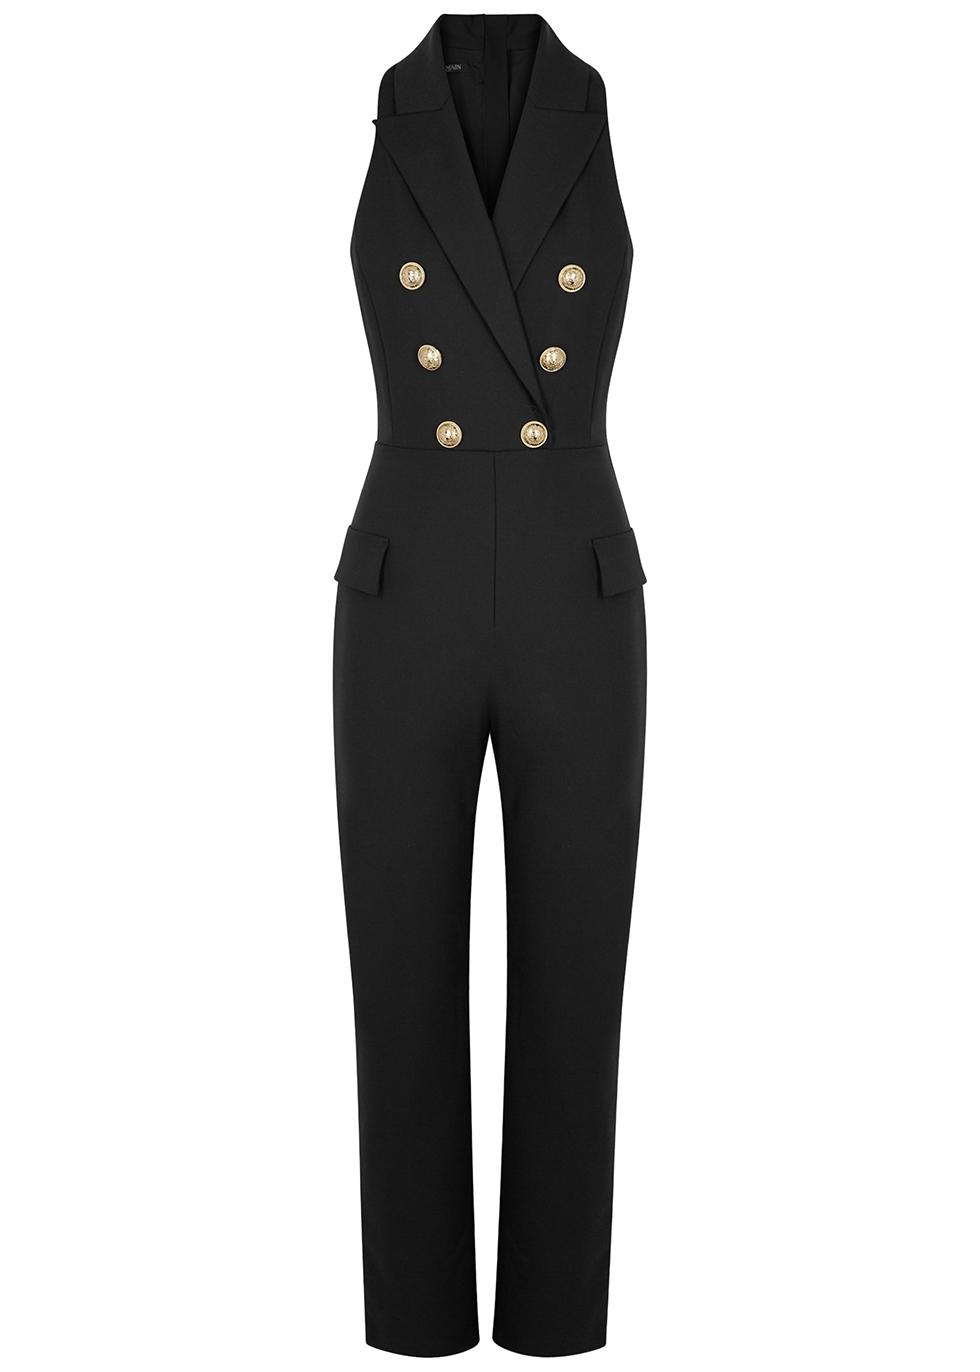 258acaa8 Designer Jumpsuits and Luxury Playsuits - Harvey Nichols